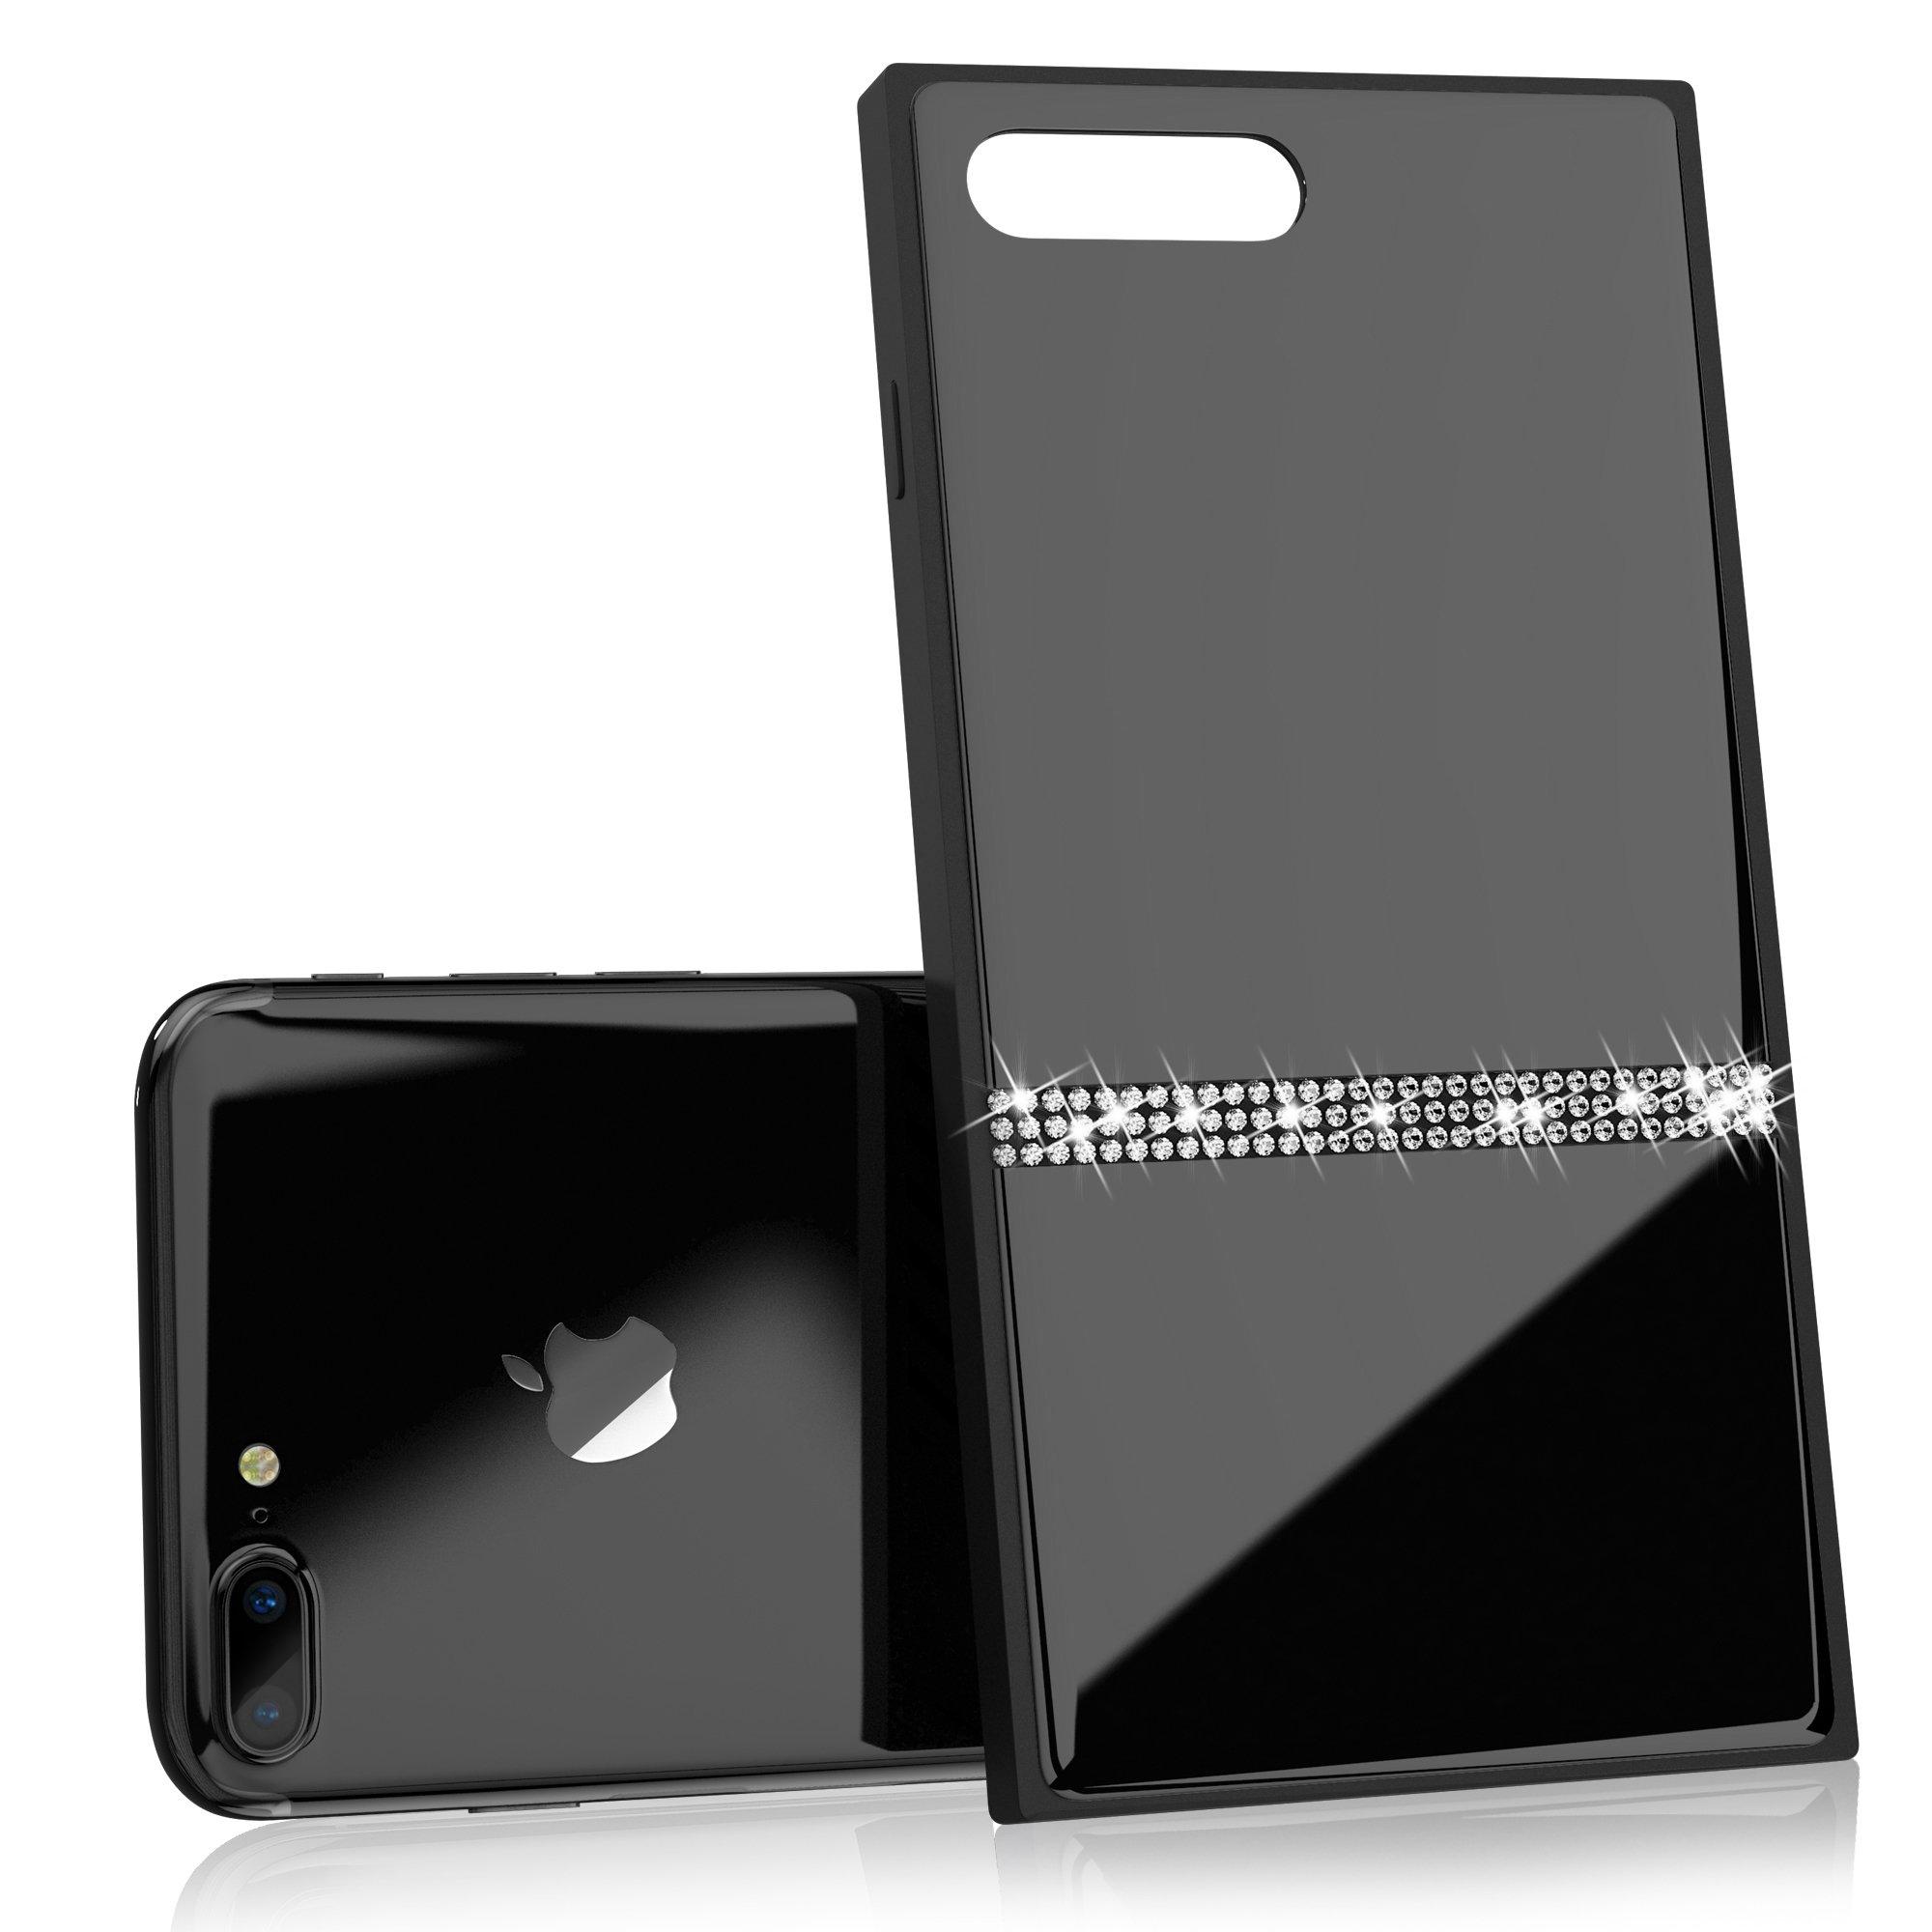 Luxury iPhone 7 Plus/iPhone 8 Plus Case Rhinestones 9H Tempered Glass, Drop Protection, Wireless Charging Compatible Apple iPhone 7 Plus (2016) / iPhone 8 Plus (2017) - Black